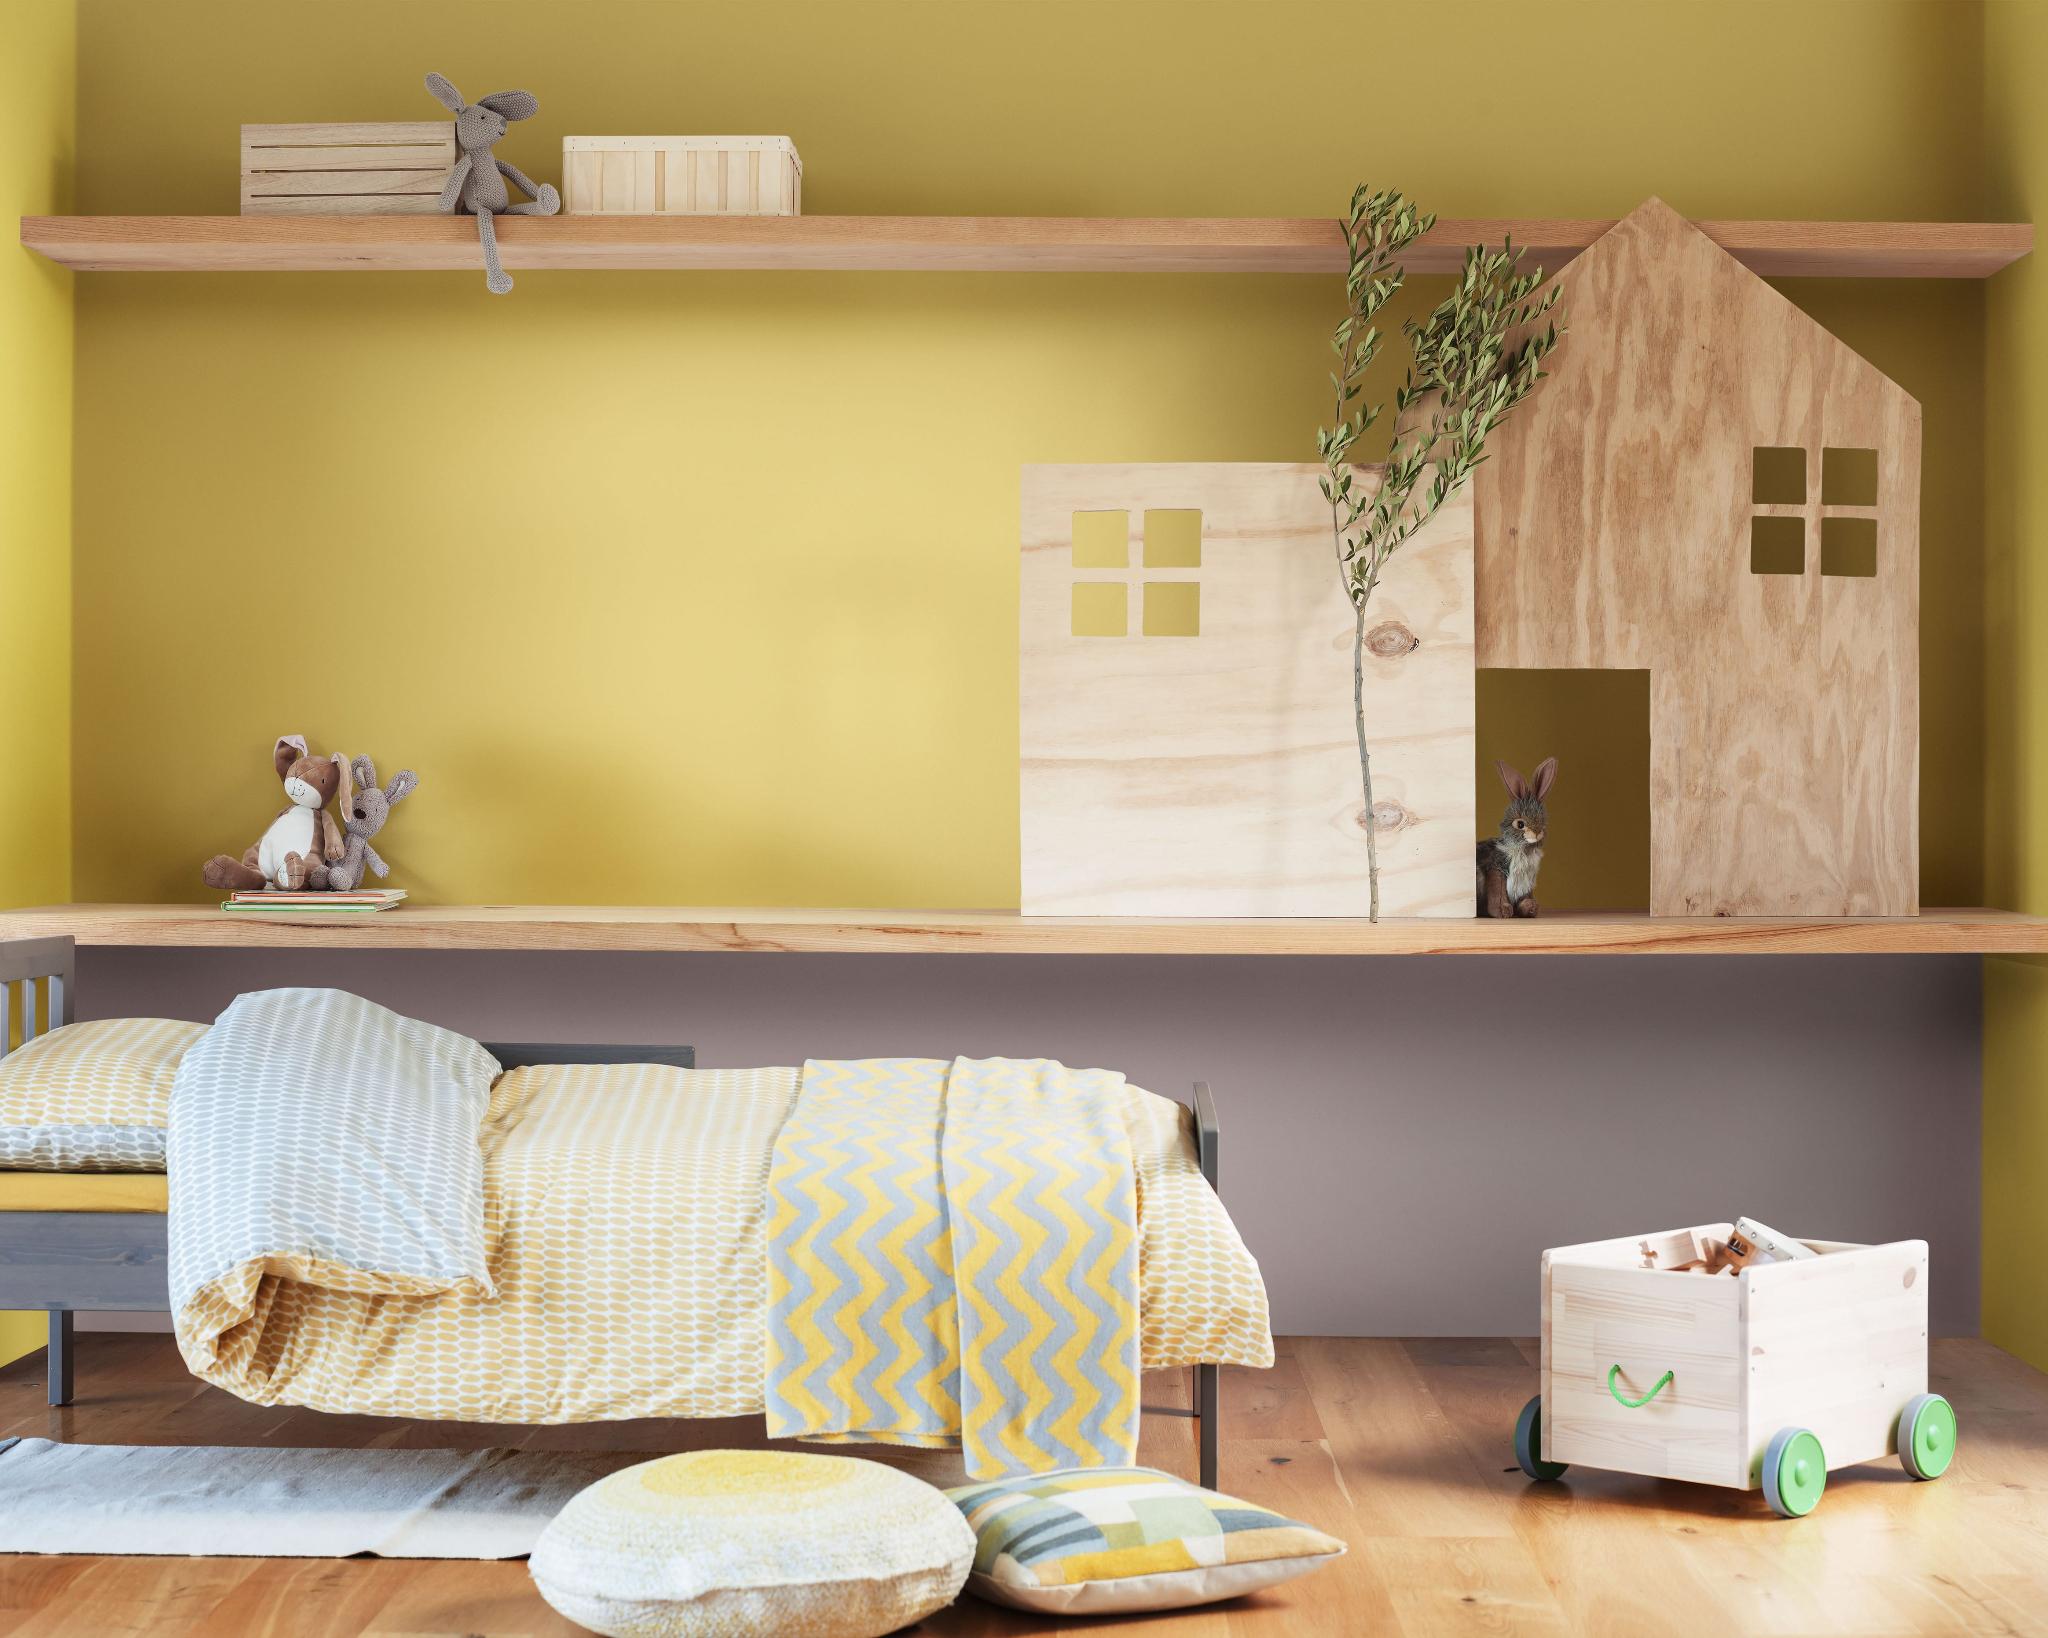 cf18_consumer_playful_slough_kidsroom_-min.jpg